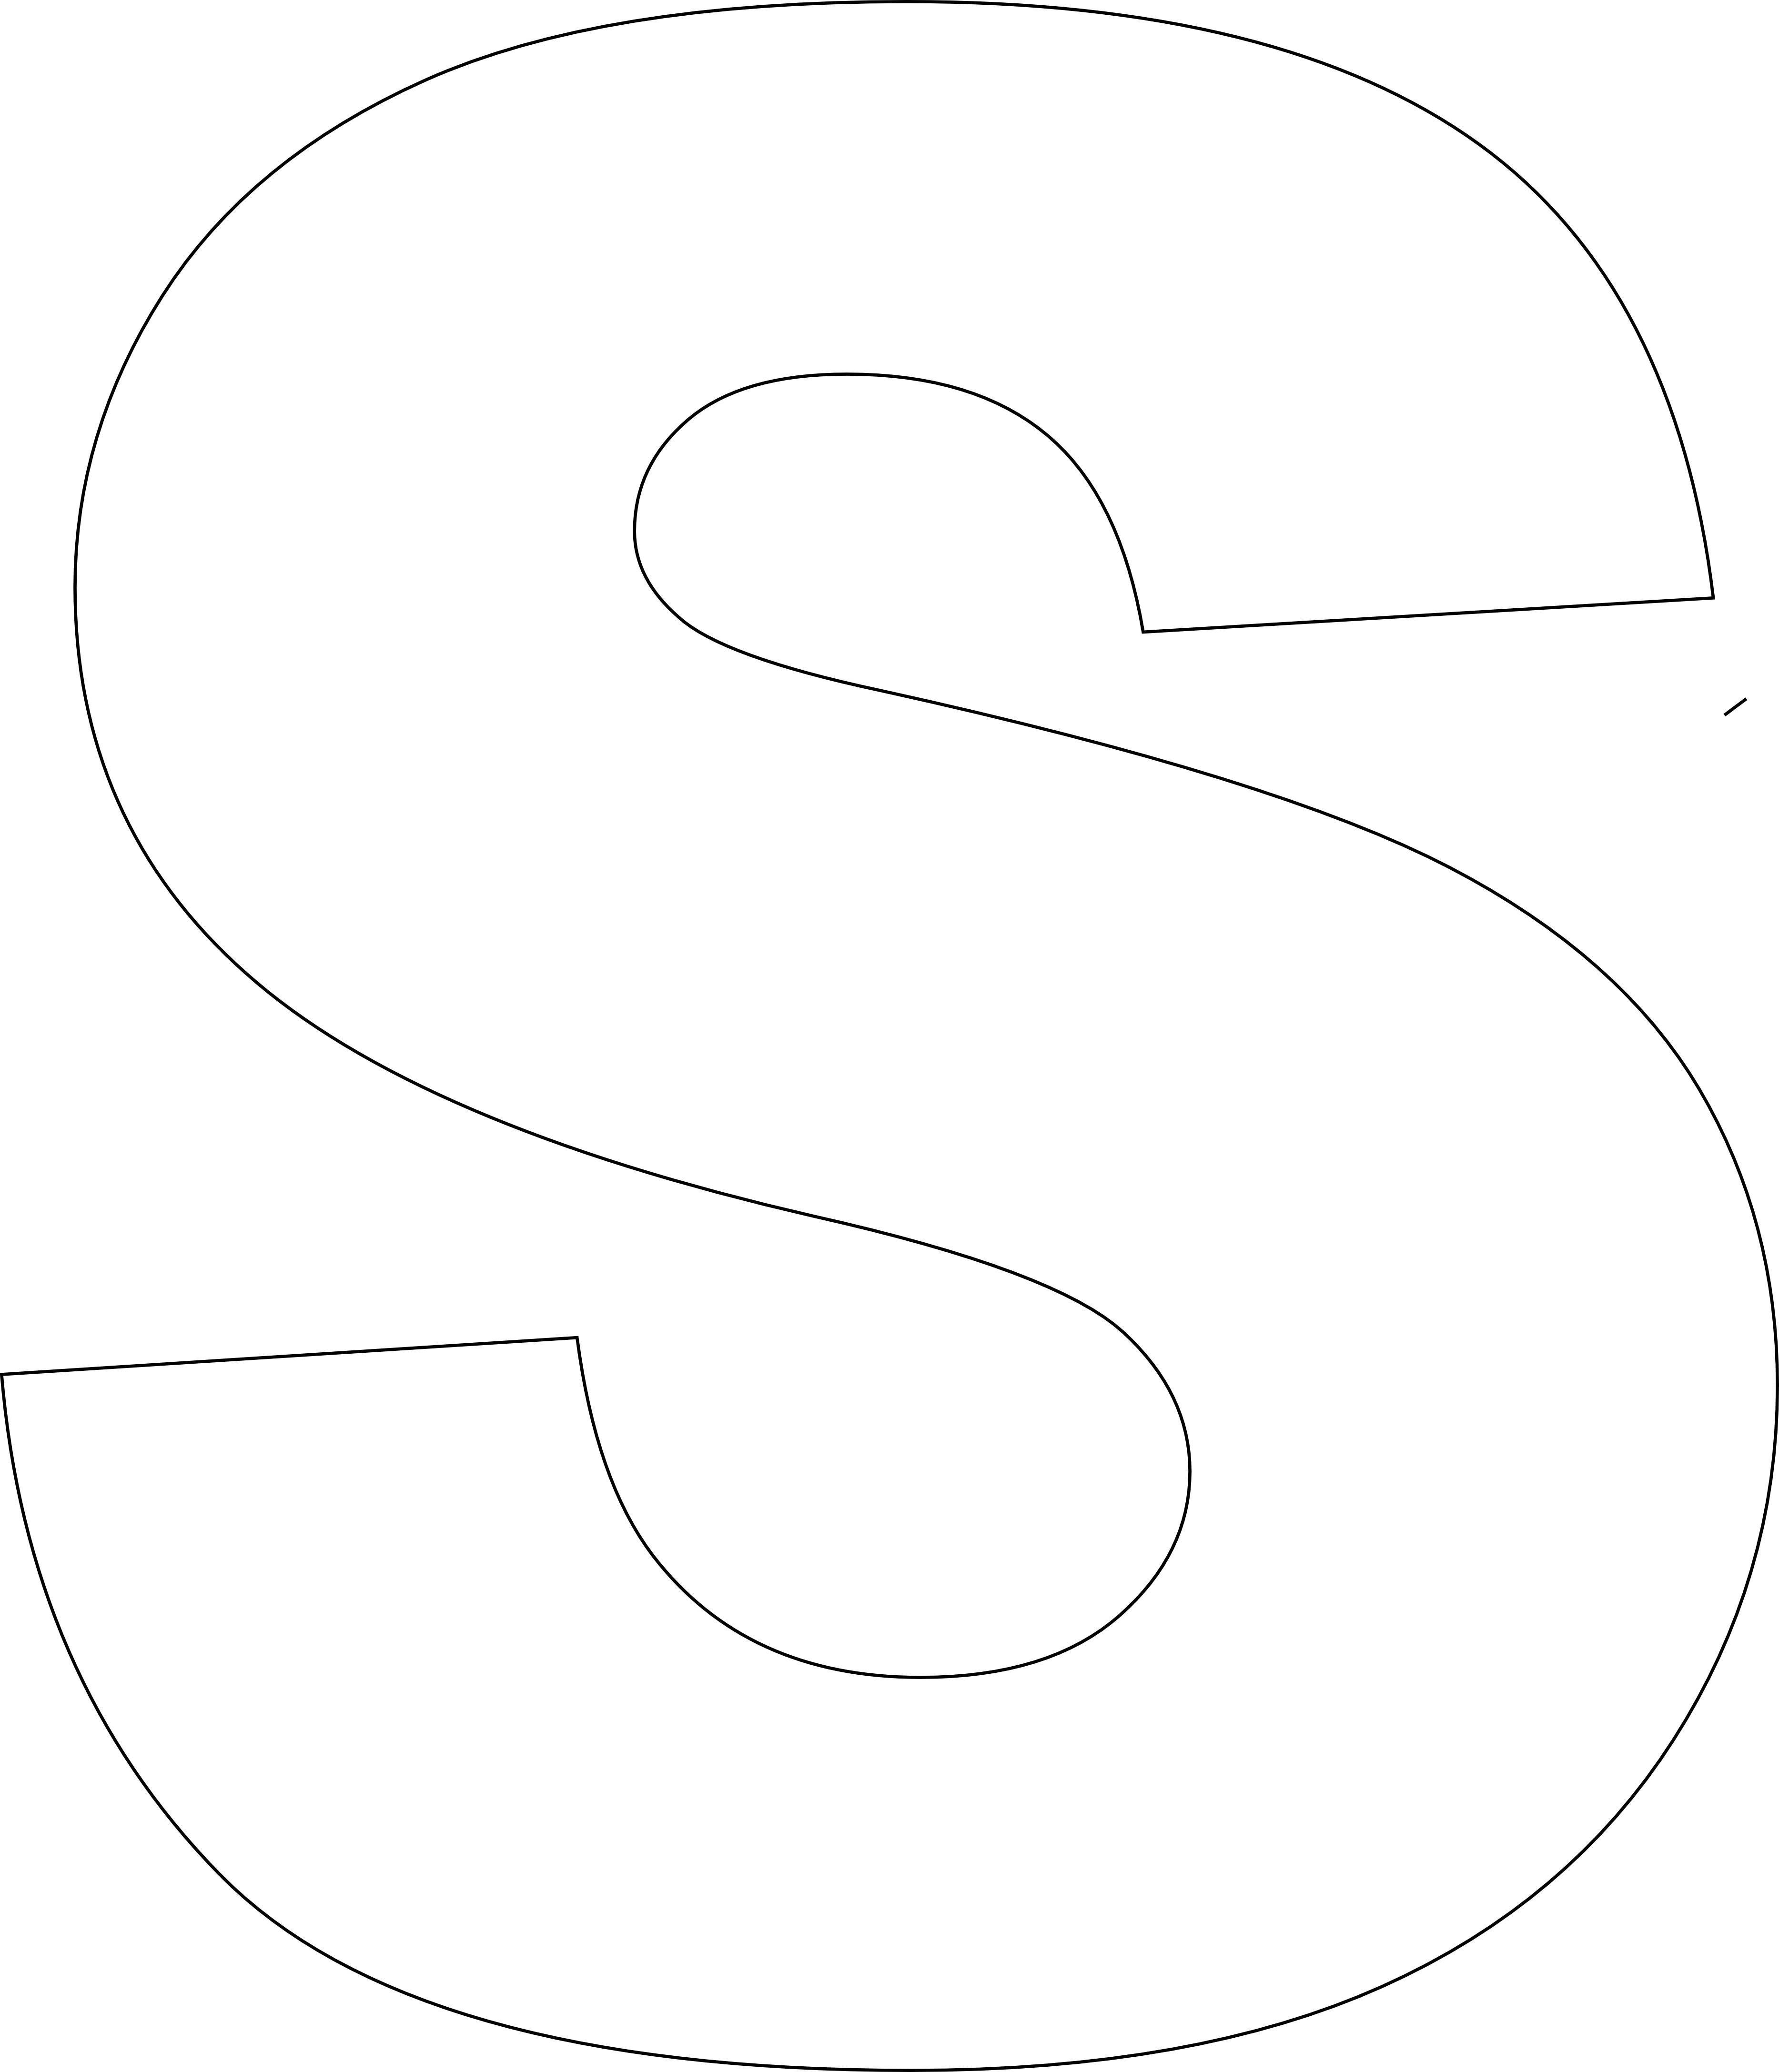 Free Printable Upper Case Alphabet Template | Craft Ideas | Alphabet - Free Printable Letter Templates